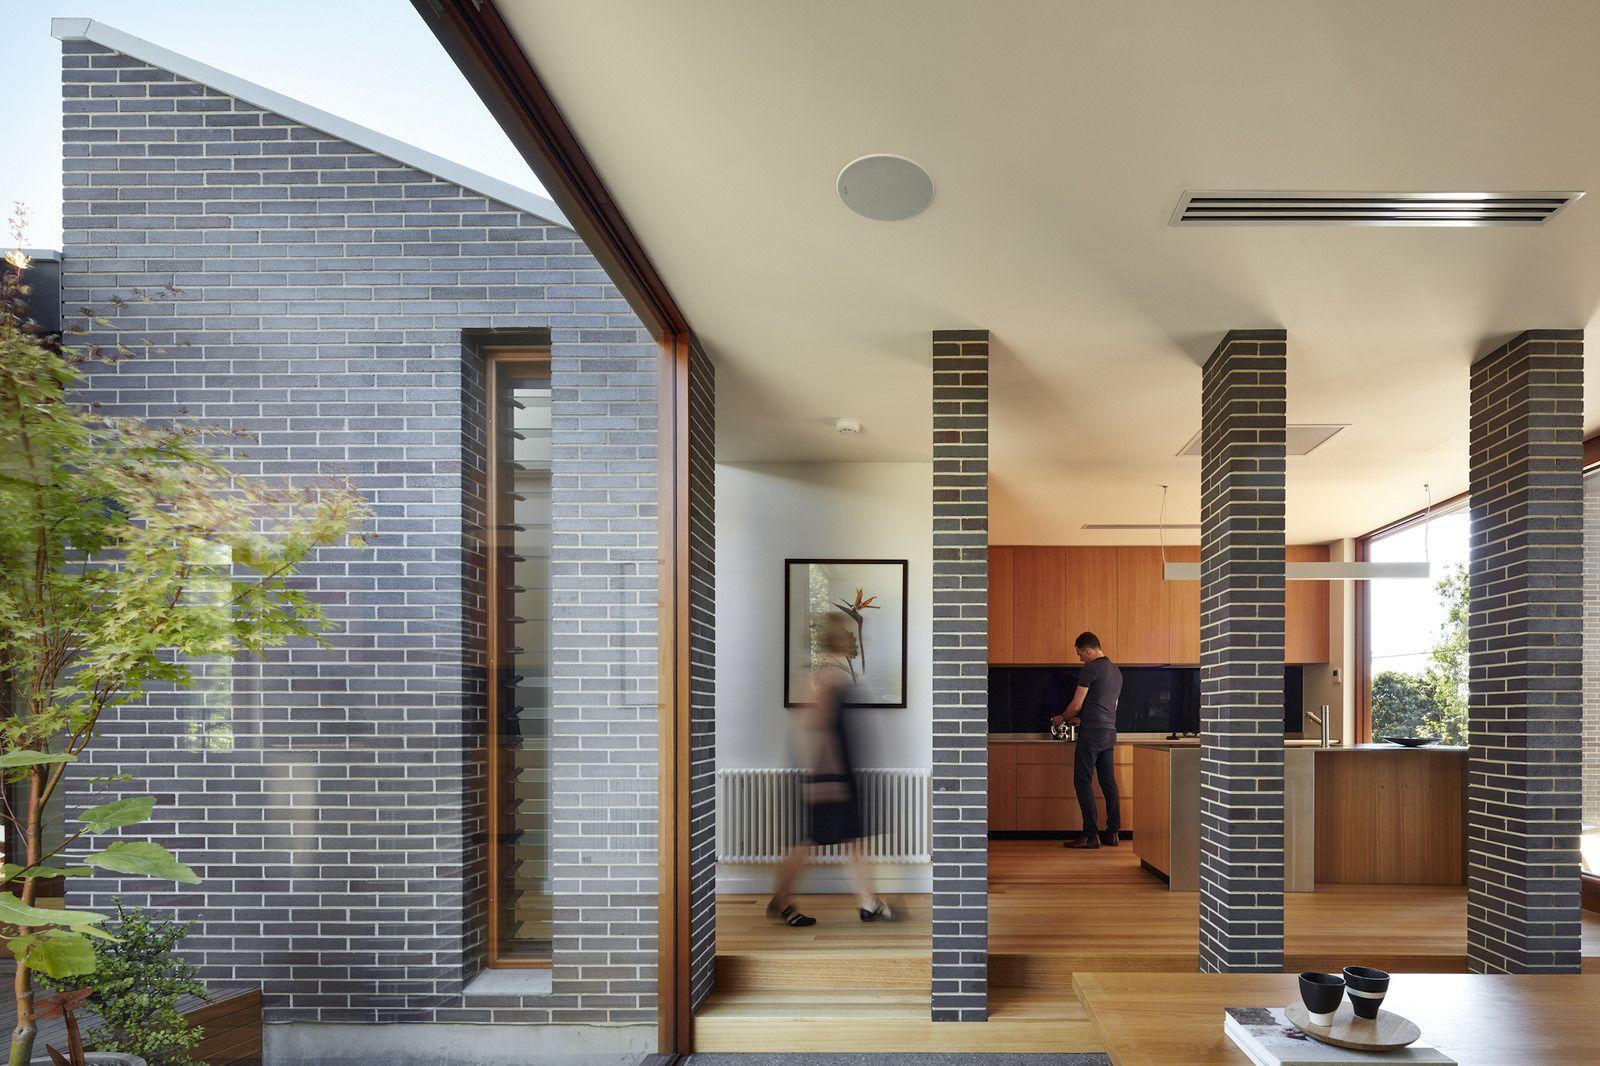 Bowral50 Bricks In Bowral Blue Architecture Architect